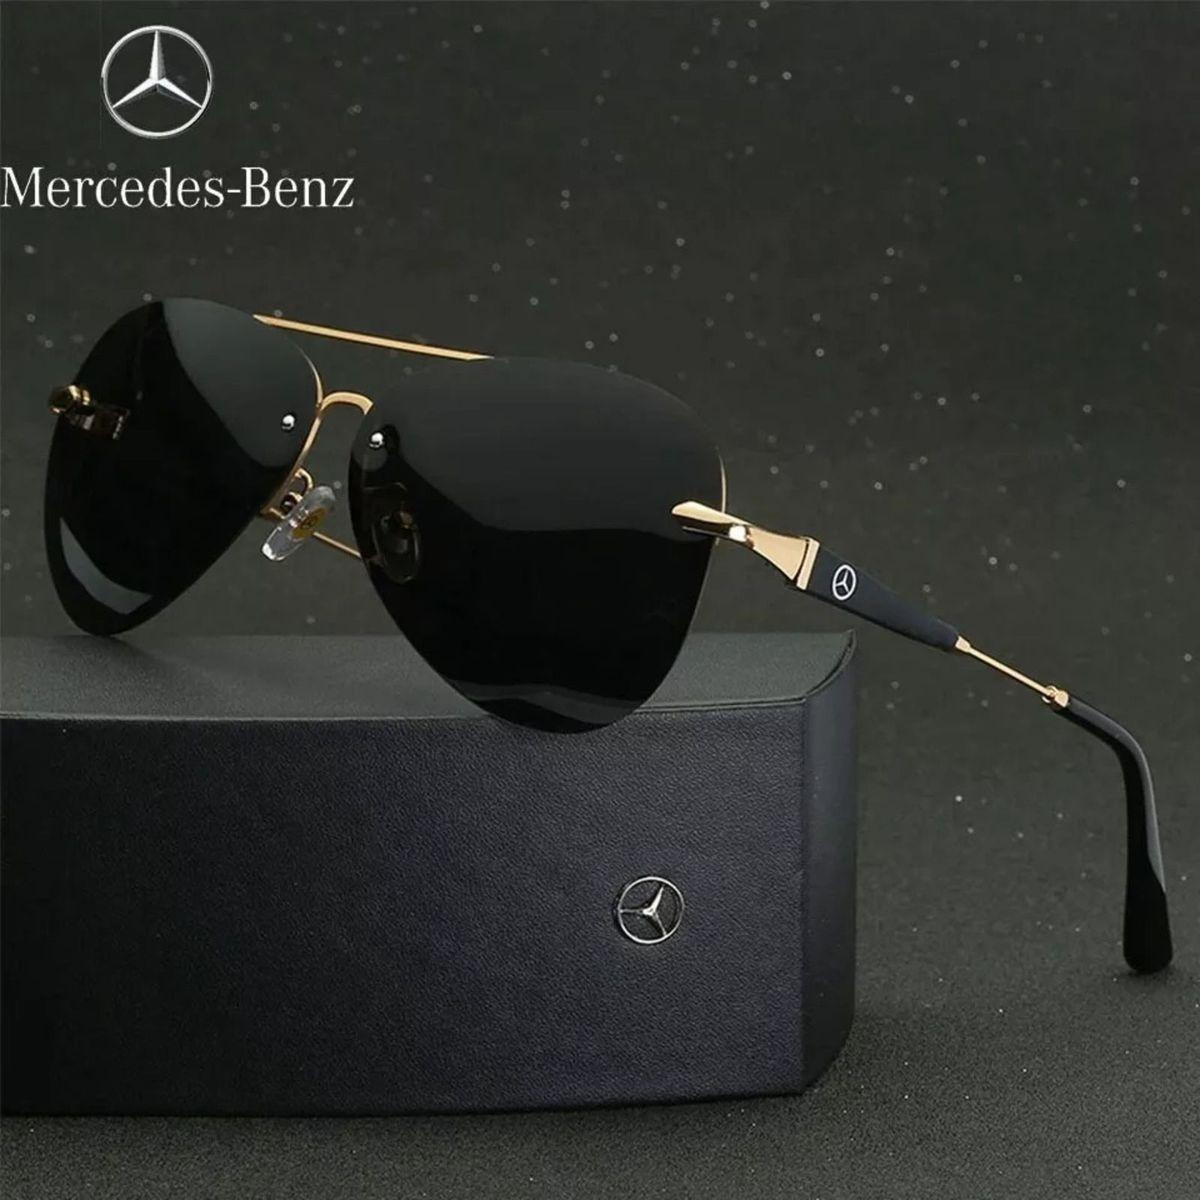 óculos de sol mercedes benz lentes polarizadas uv400 - óculos sem marca 4053e377d5